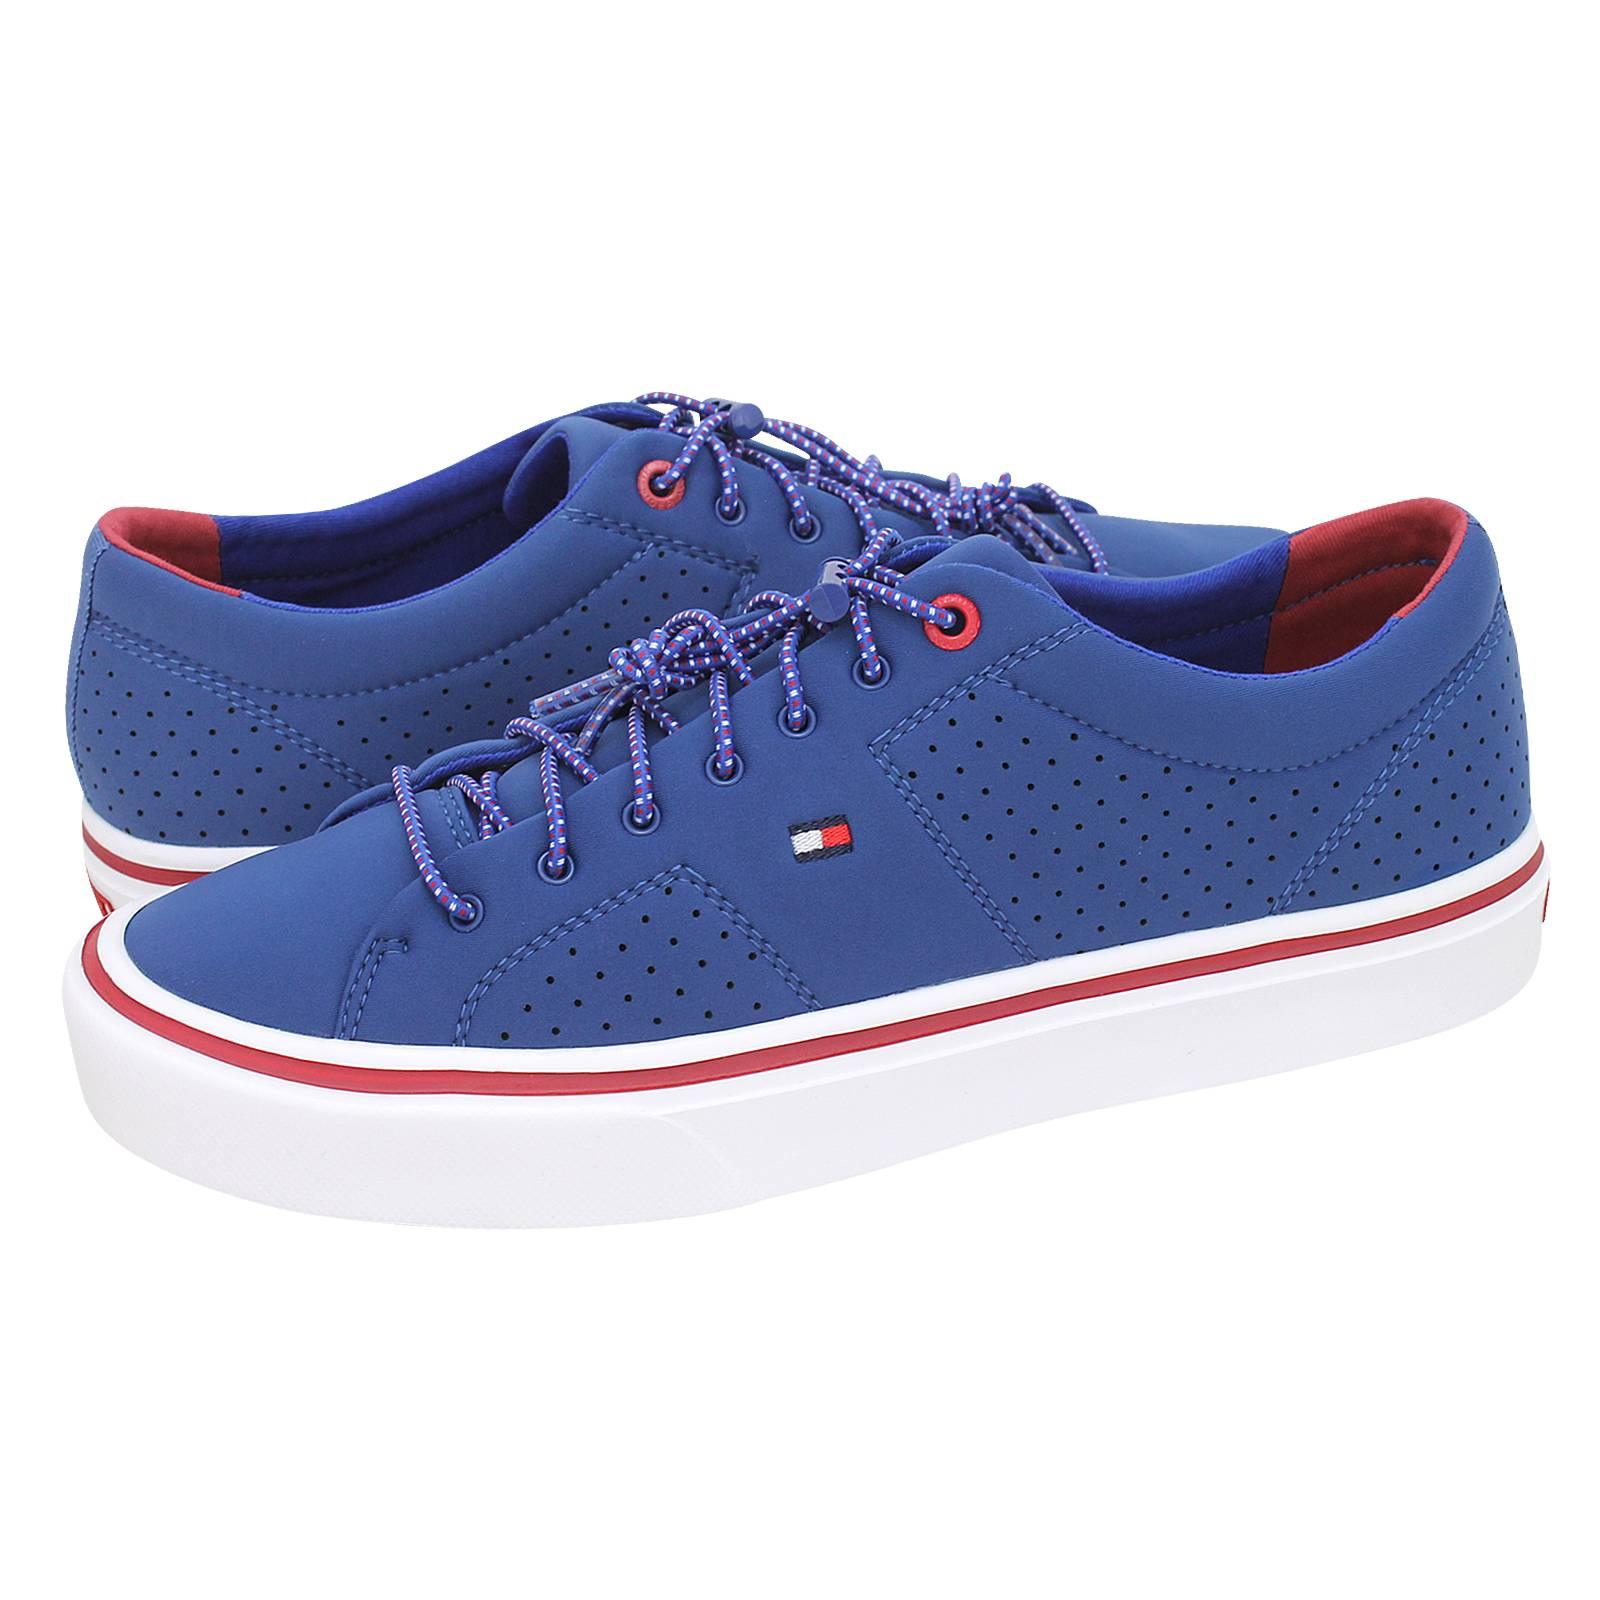 f9c5450ad5a62 Tommy Hilfiger Lightweight Neoprene Sneaker casual shoes. Lightweight  Neoprene Sneaker